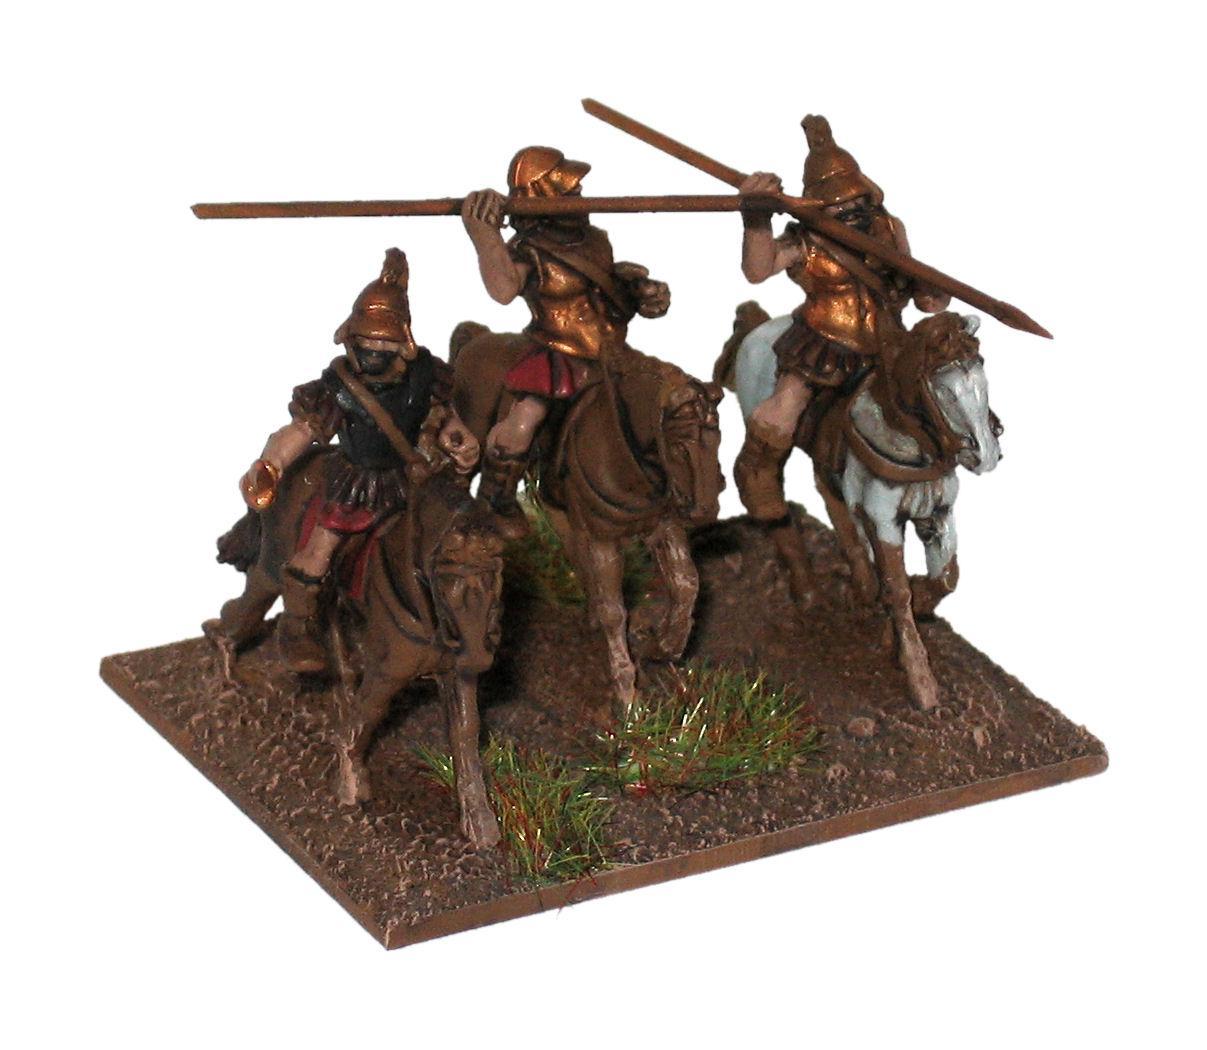 15mm, Antiquitatis, Bellis, Cavalry, Dba, Macedonian